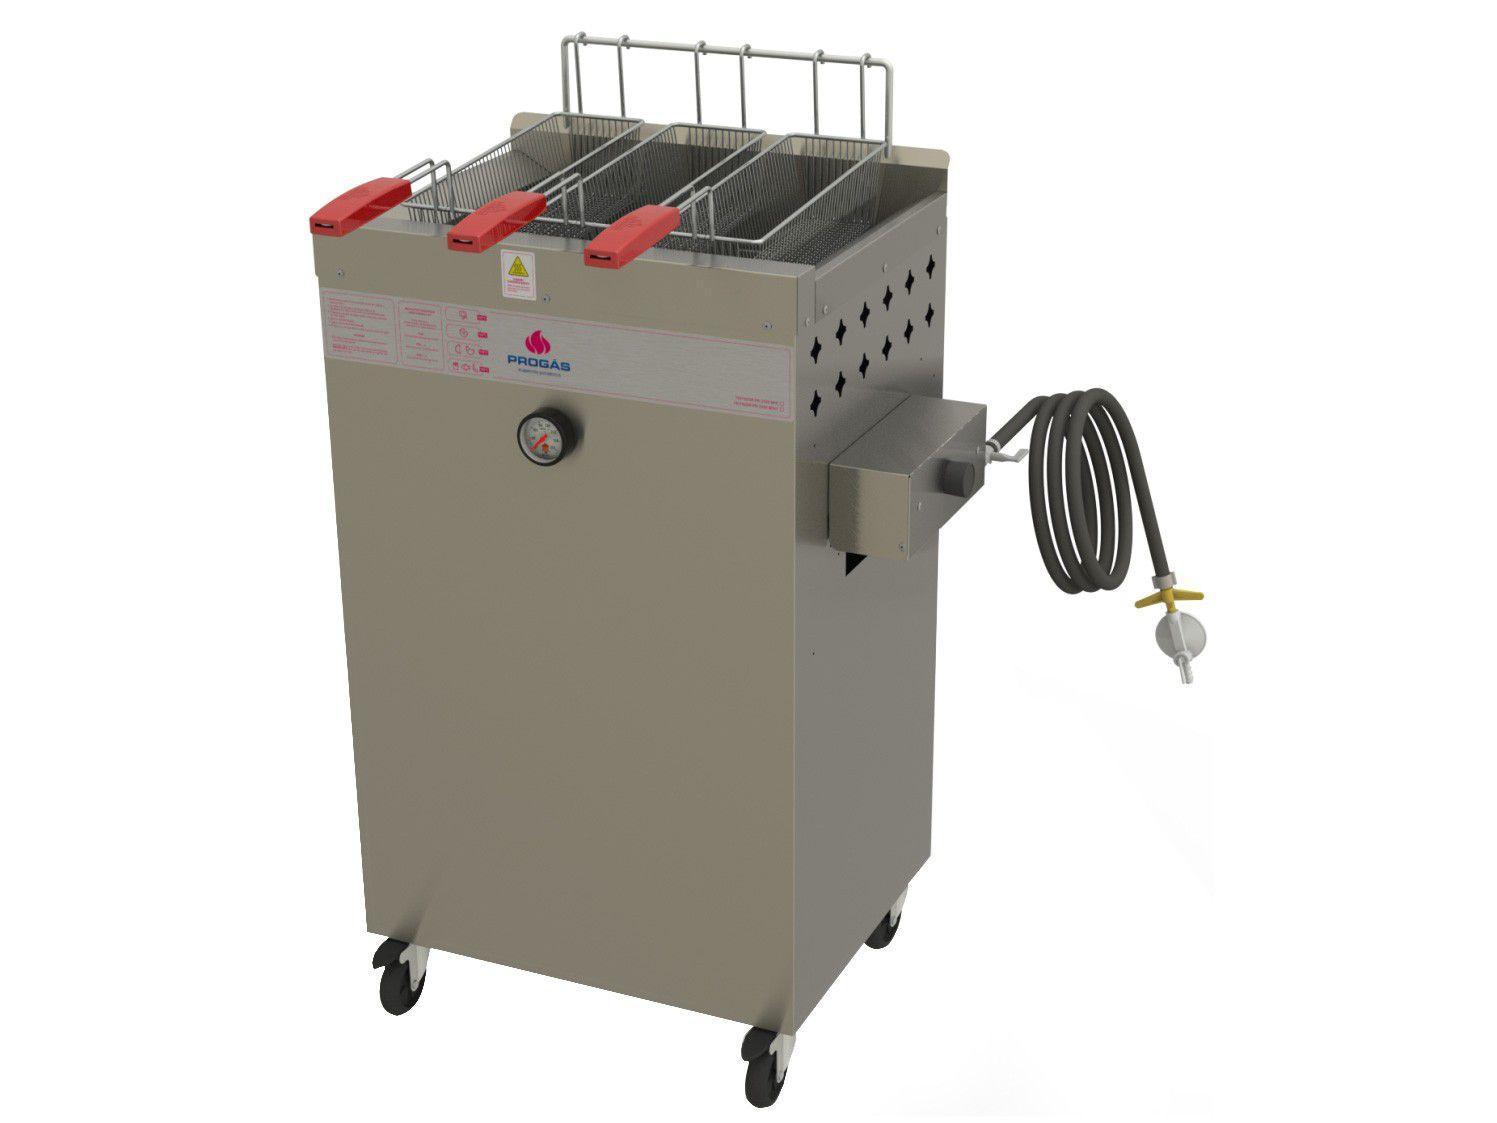 Fritadeira Industrial a Gás Progás - Fry Fritter Style PR-2000BPG 20L 1 Cuba 3 Cestos